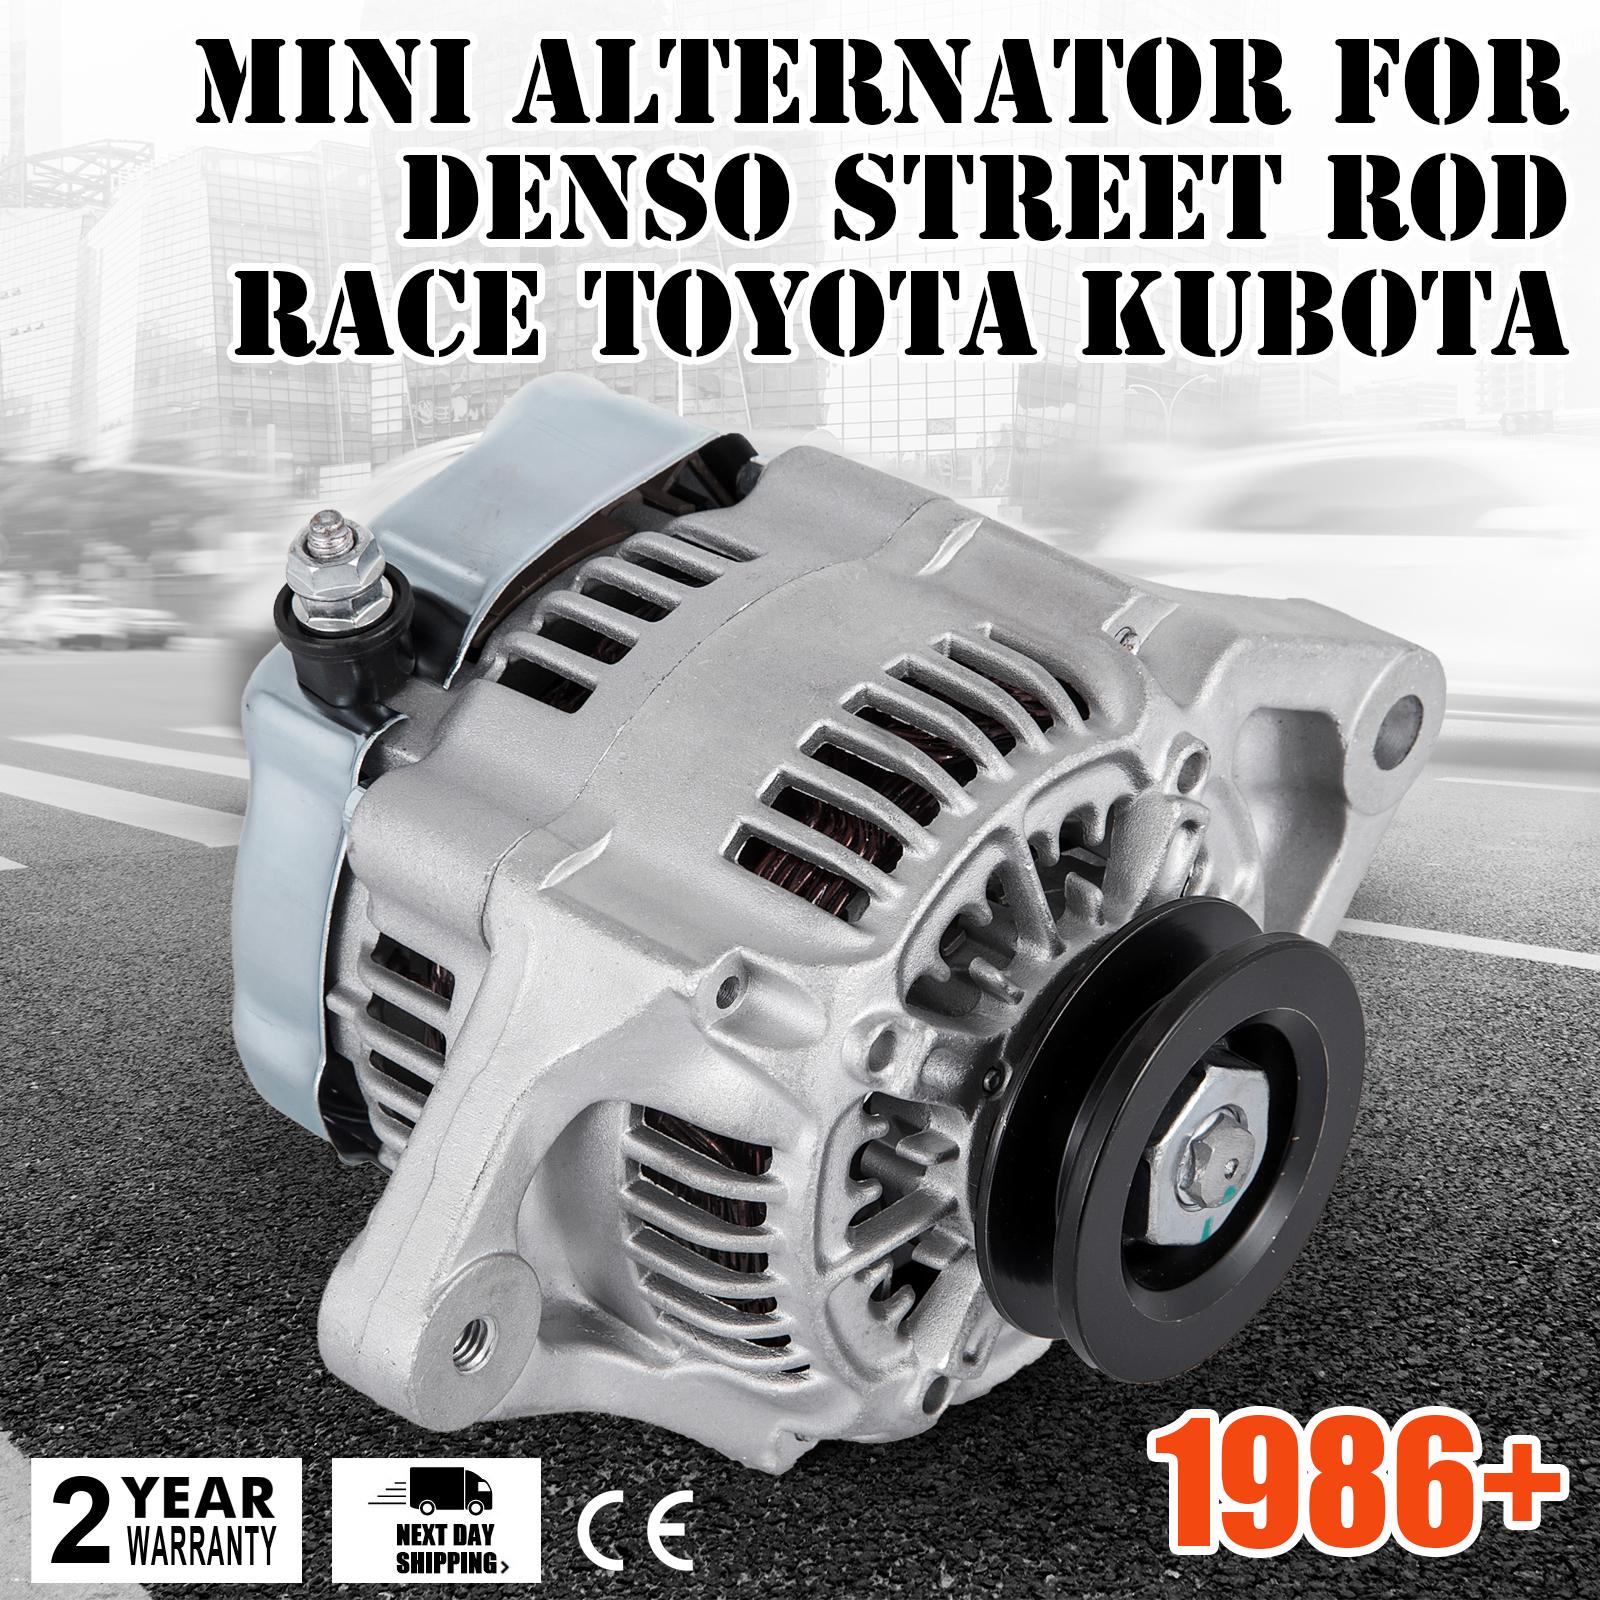 Holden Commodore Bonnet Stay Rod Repair Kit VL hood holder pole Resto Country